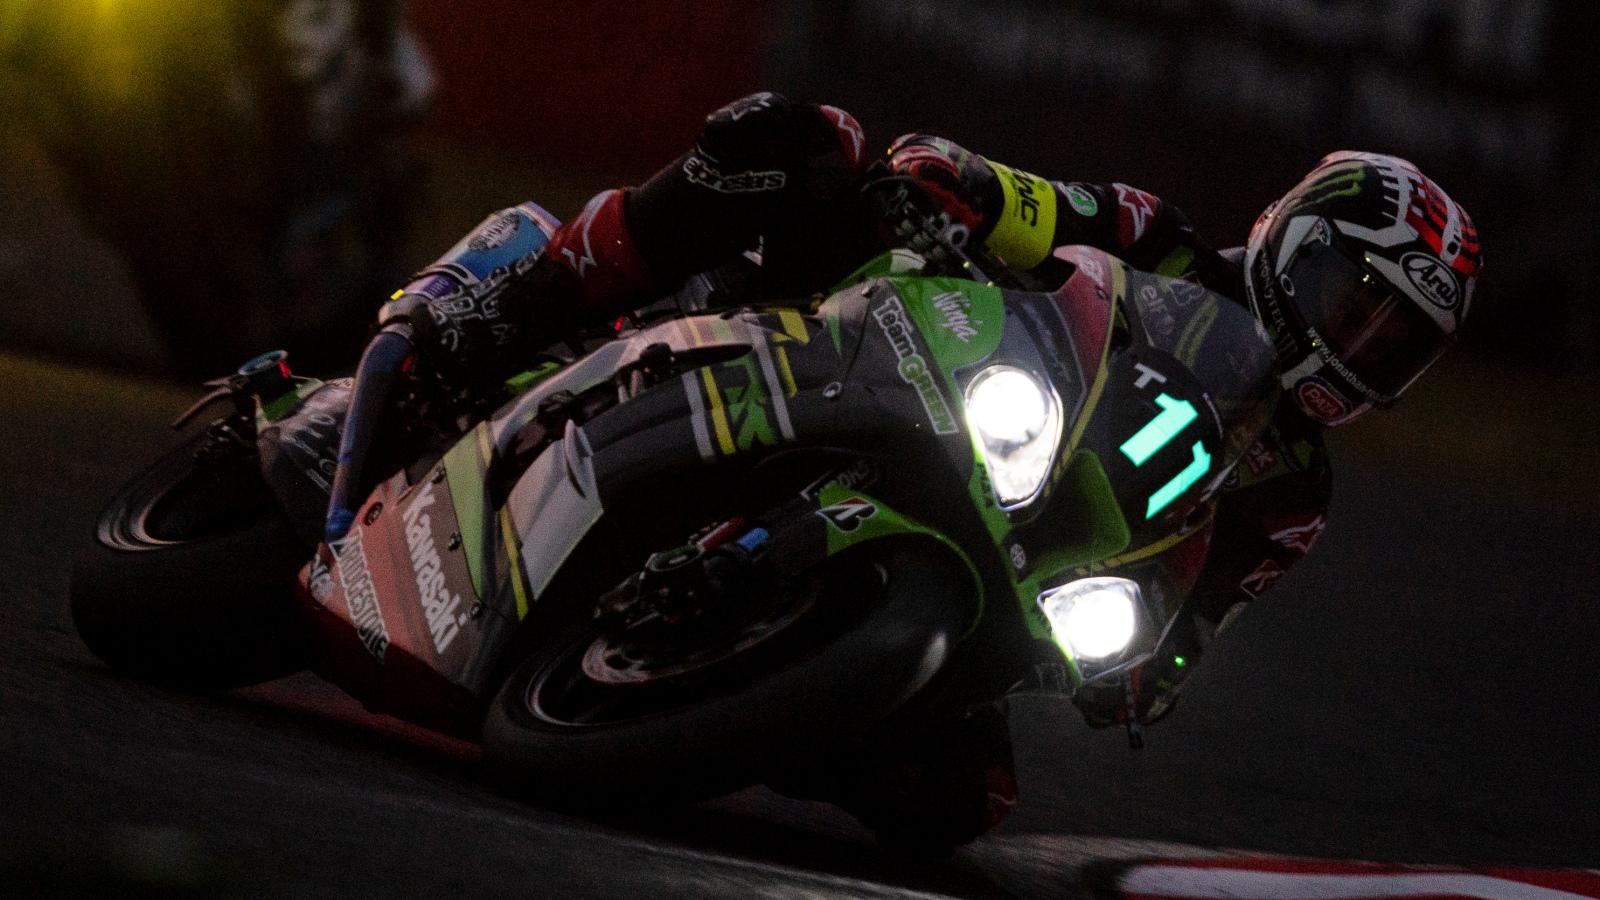 Kawasaki a las 8 horas de Suzuka 2019 con Jonathan Rea, Leon Haslam y Toprak Razgatlioglu